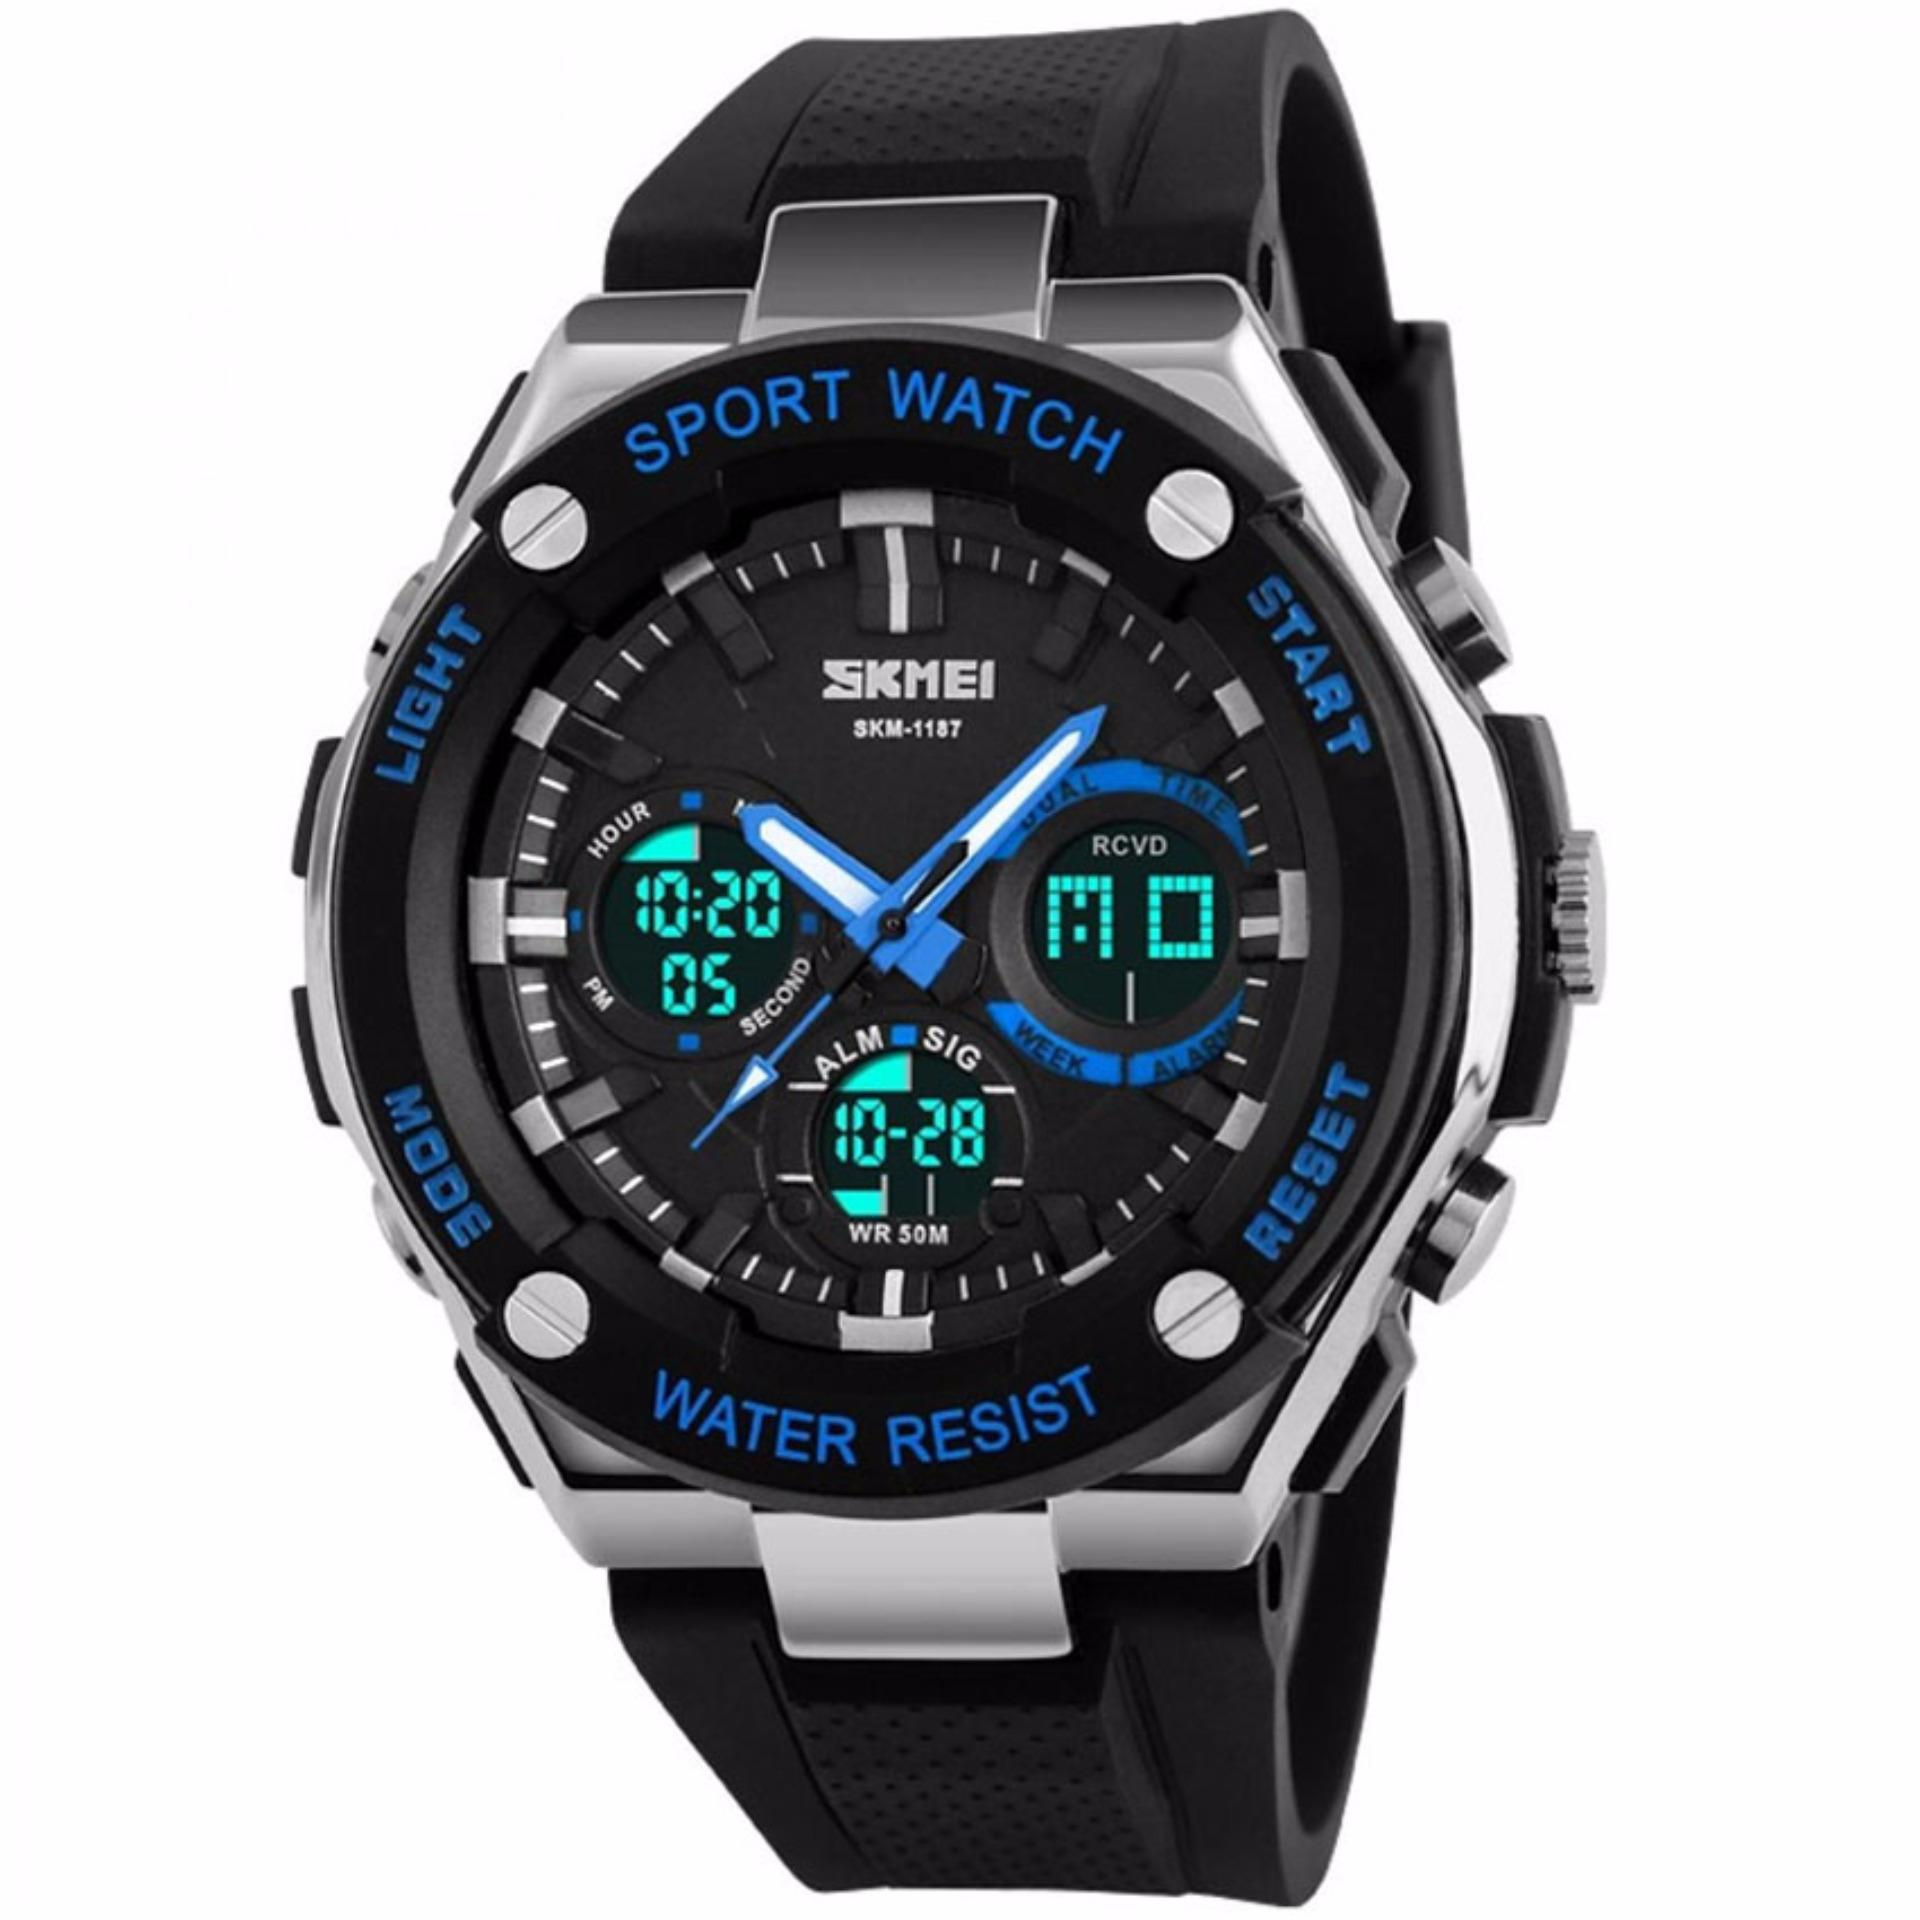 Toko Skmei Dual Time Men Sport Led Watch Water Resistant 50M Ad1187 Jam Tangan Pria Tali Karet Hitam Biru Skmei